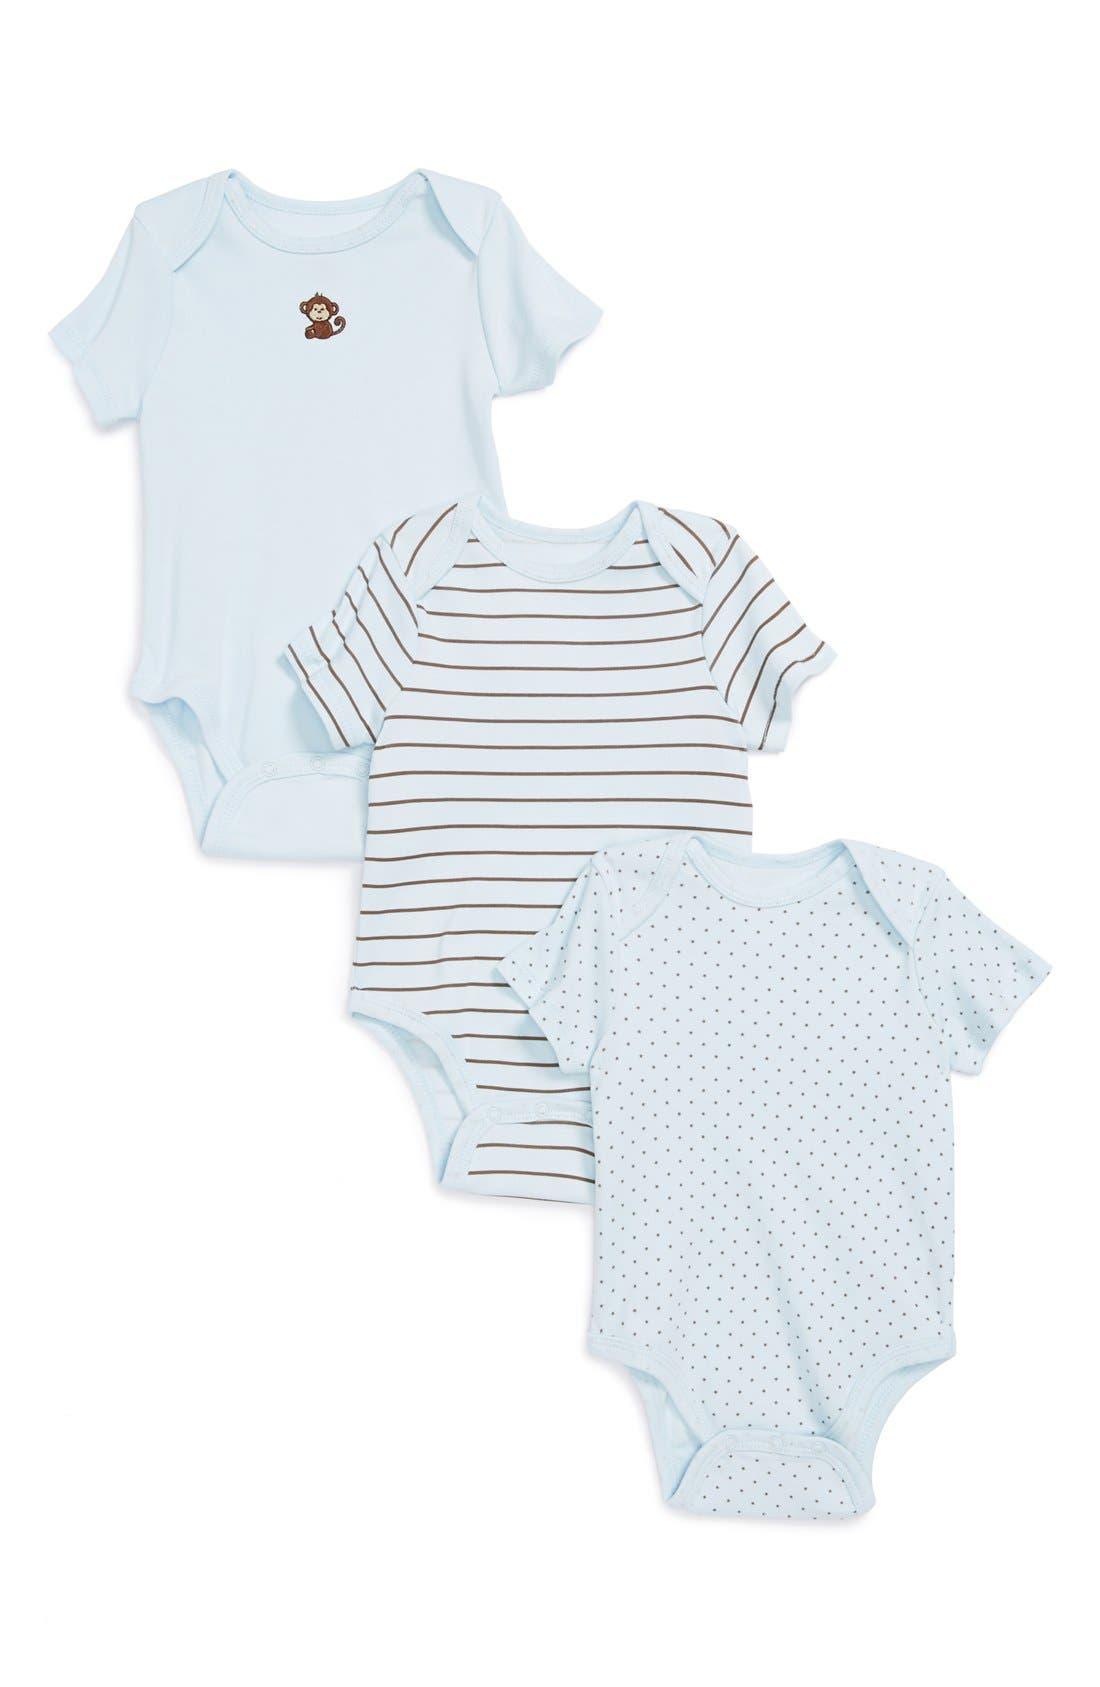 Alternate Image 1 Selected - Little Me 'Monkey' Bodysuits (Set of 3) (Baby Boys)